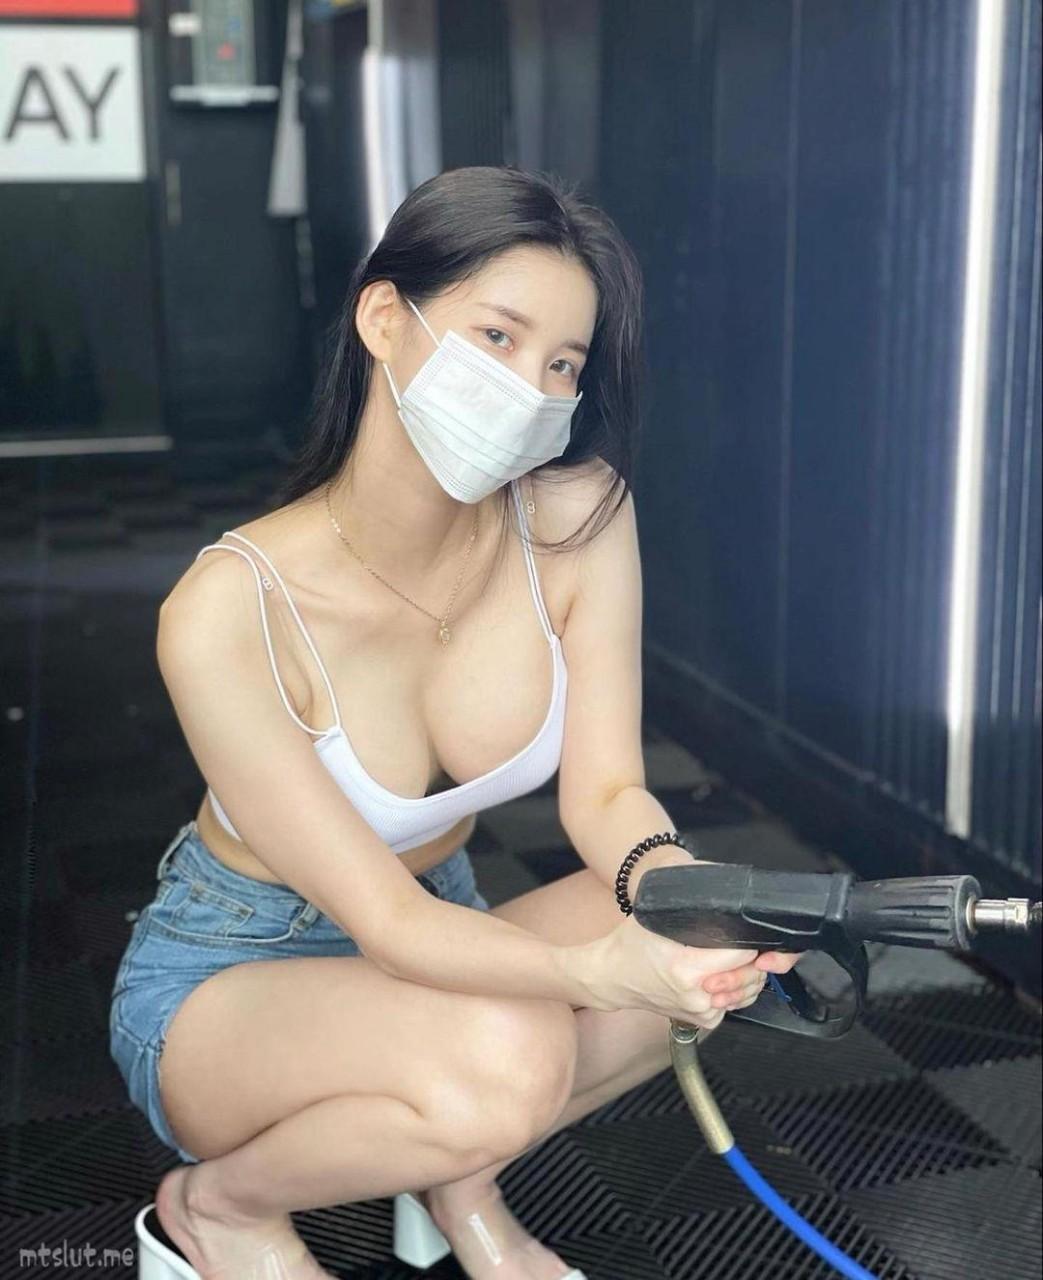 ins妹子图-精选-20210607